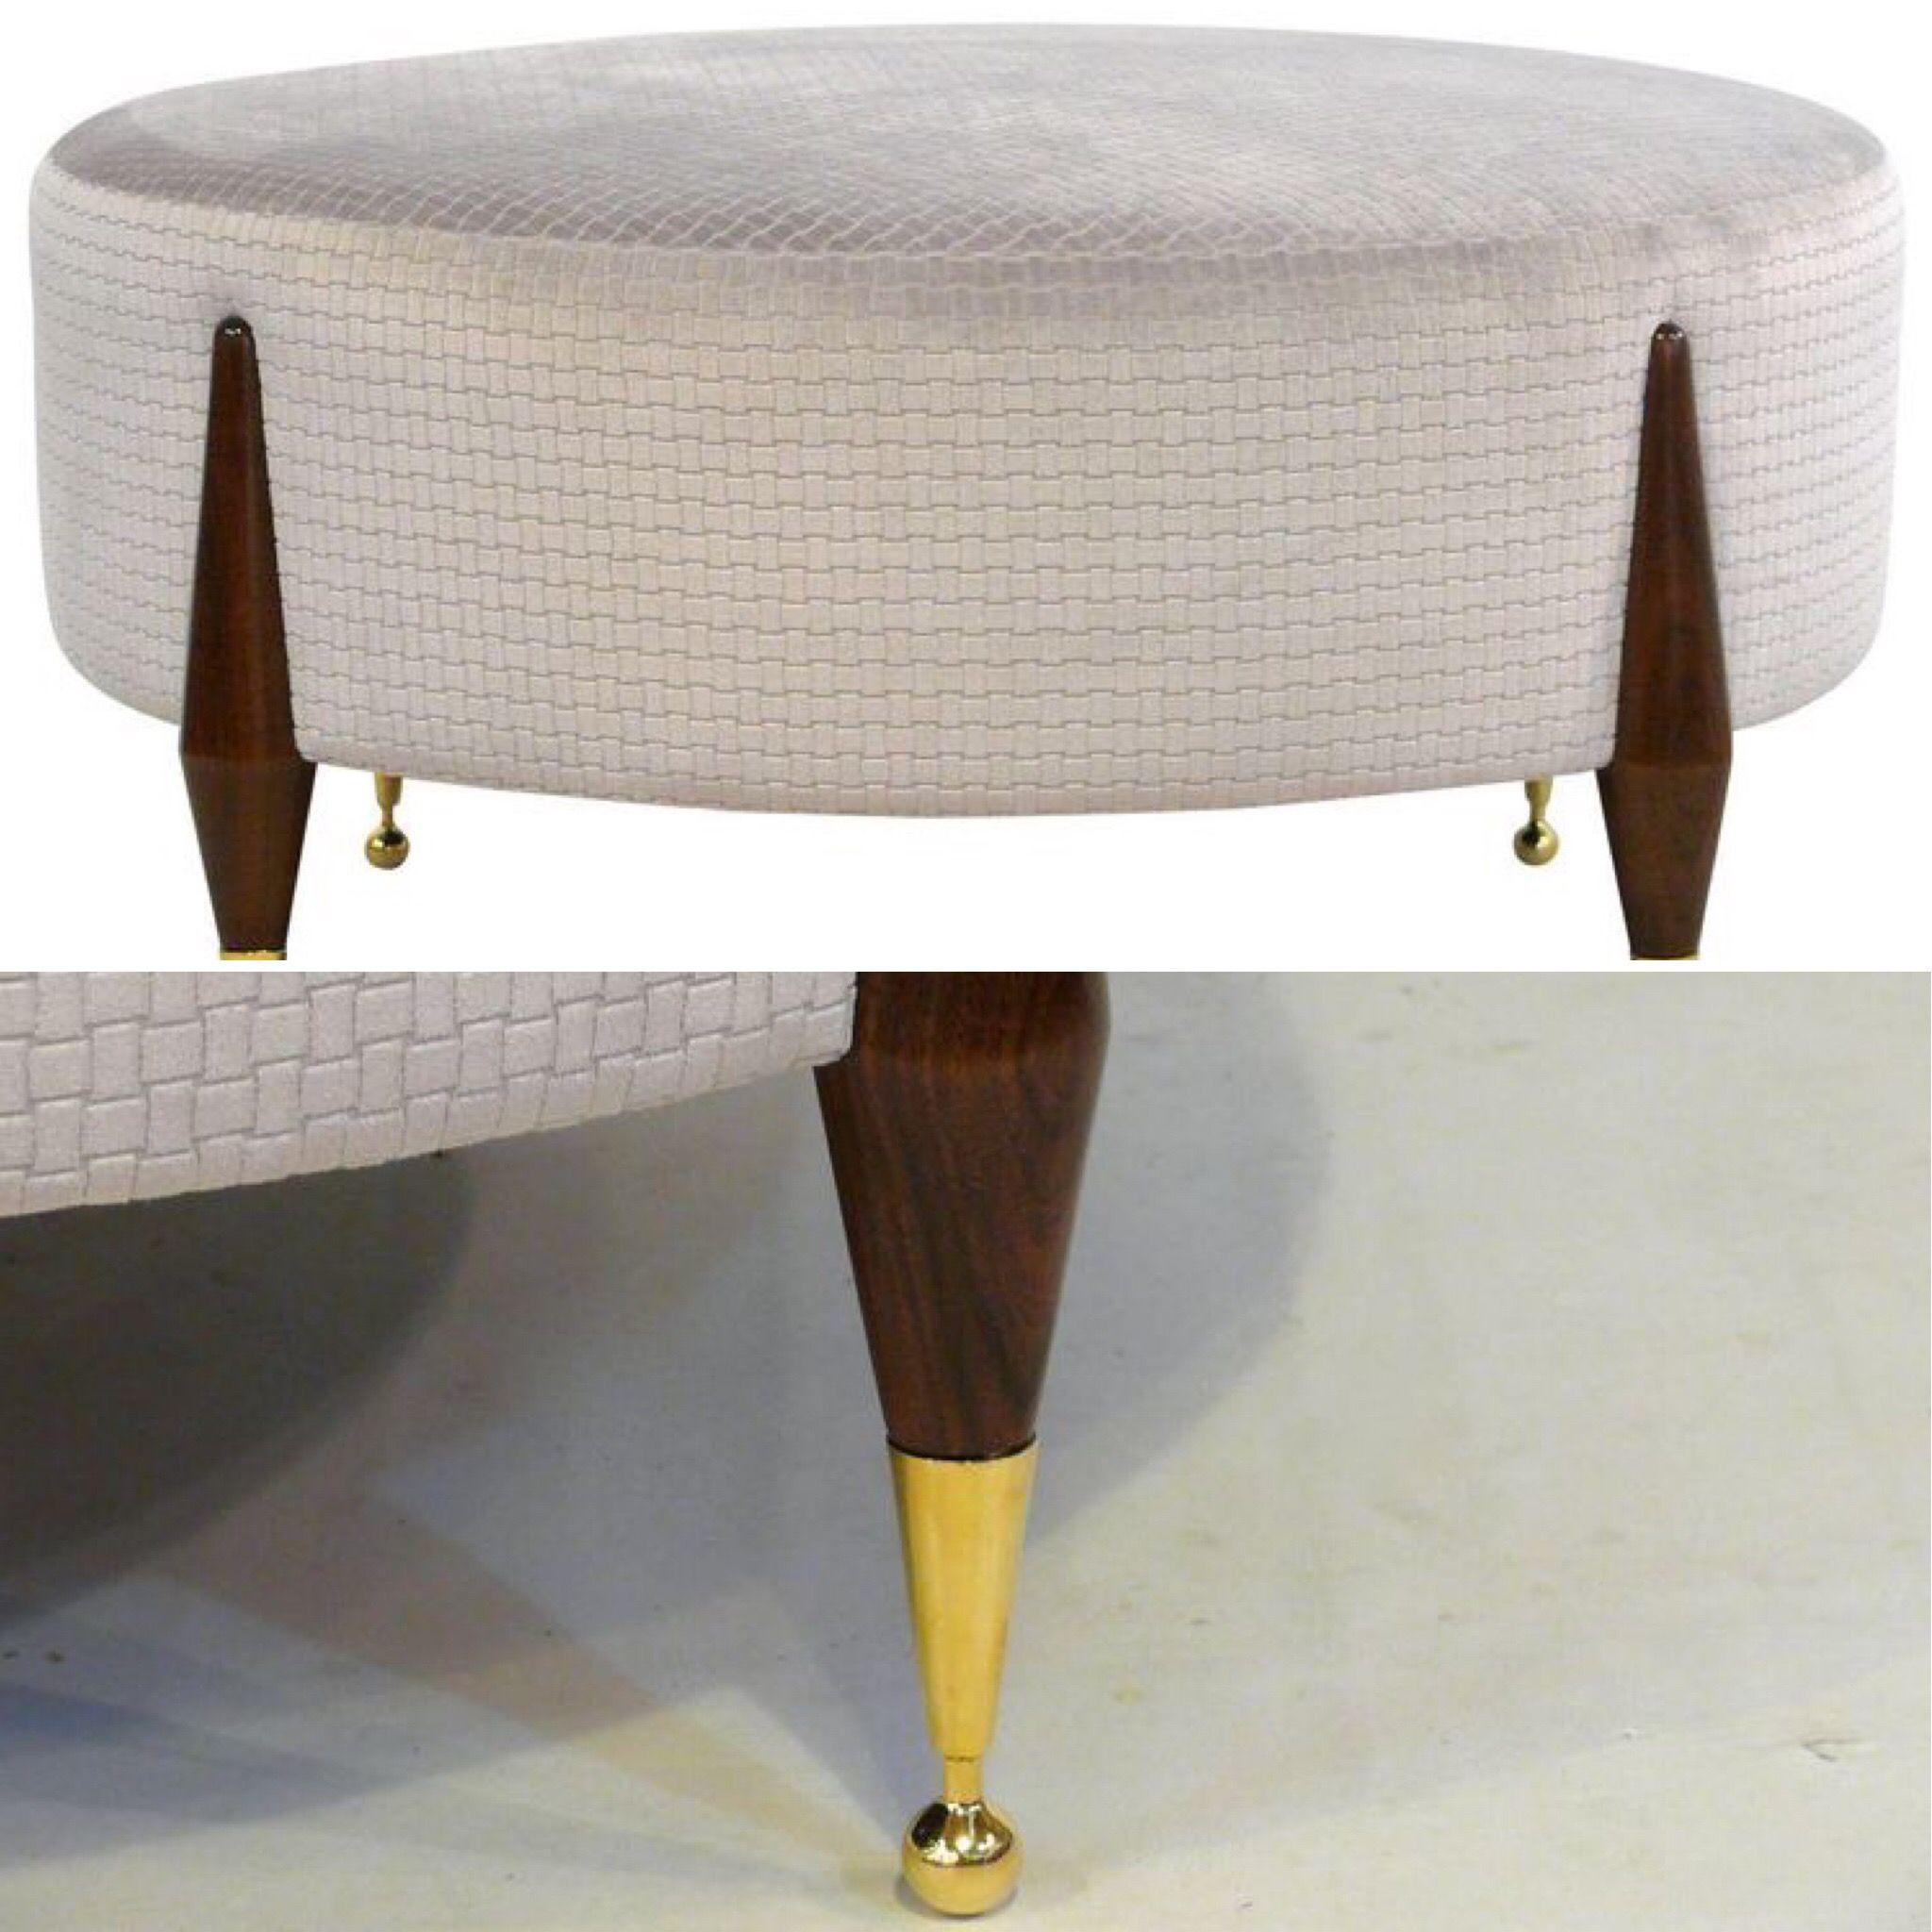 Art Deco Puf Furniture Design Furniture Ottoman Stool